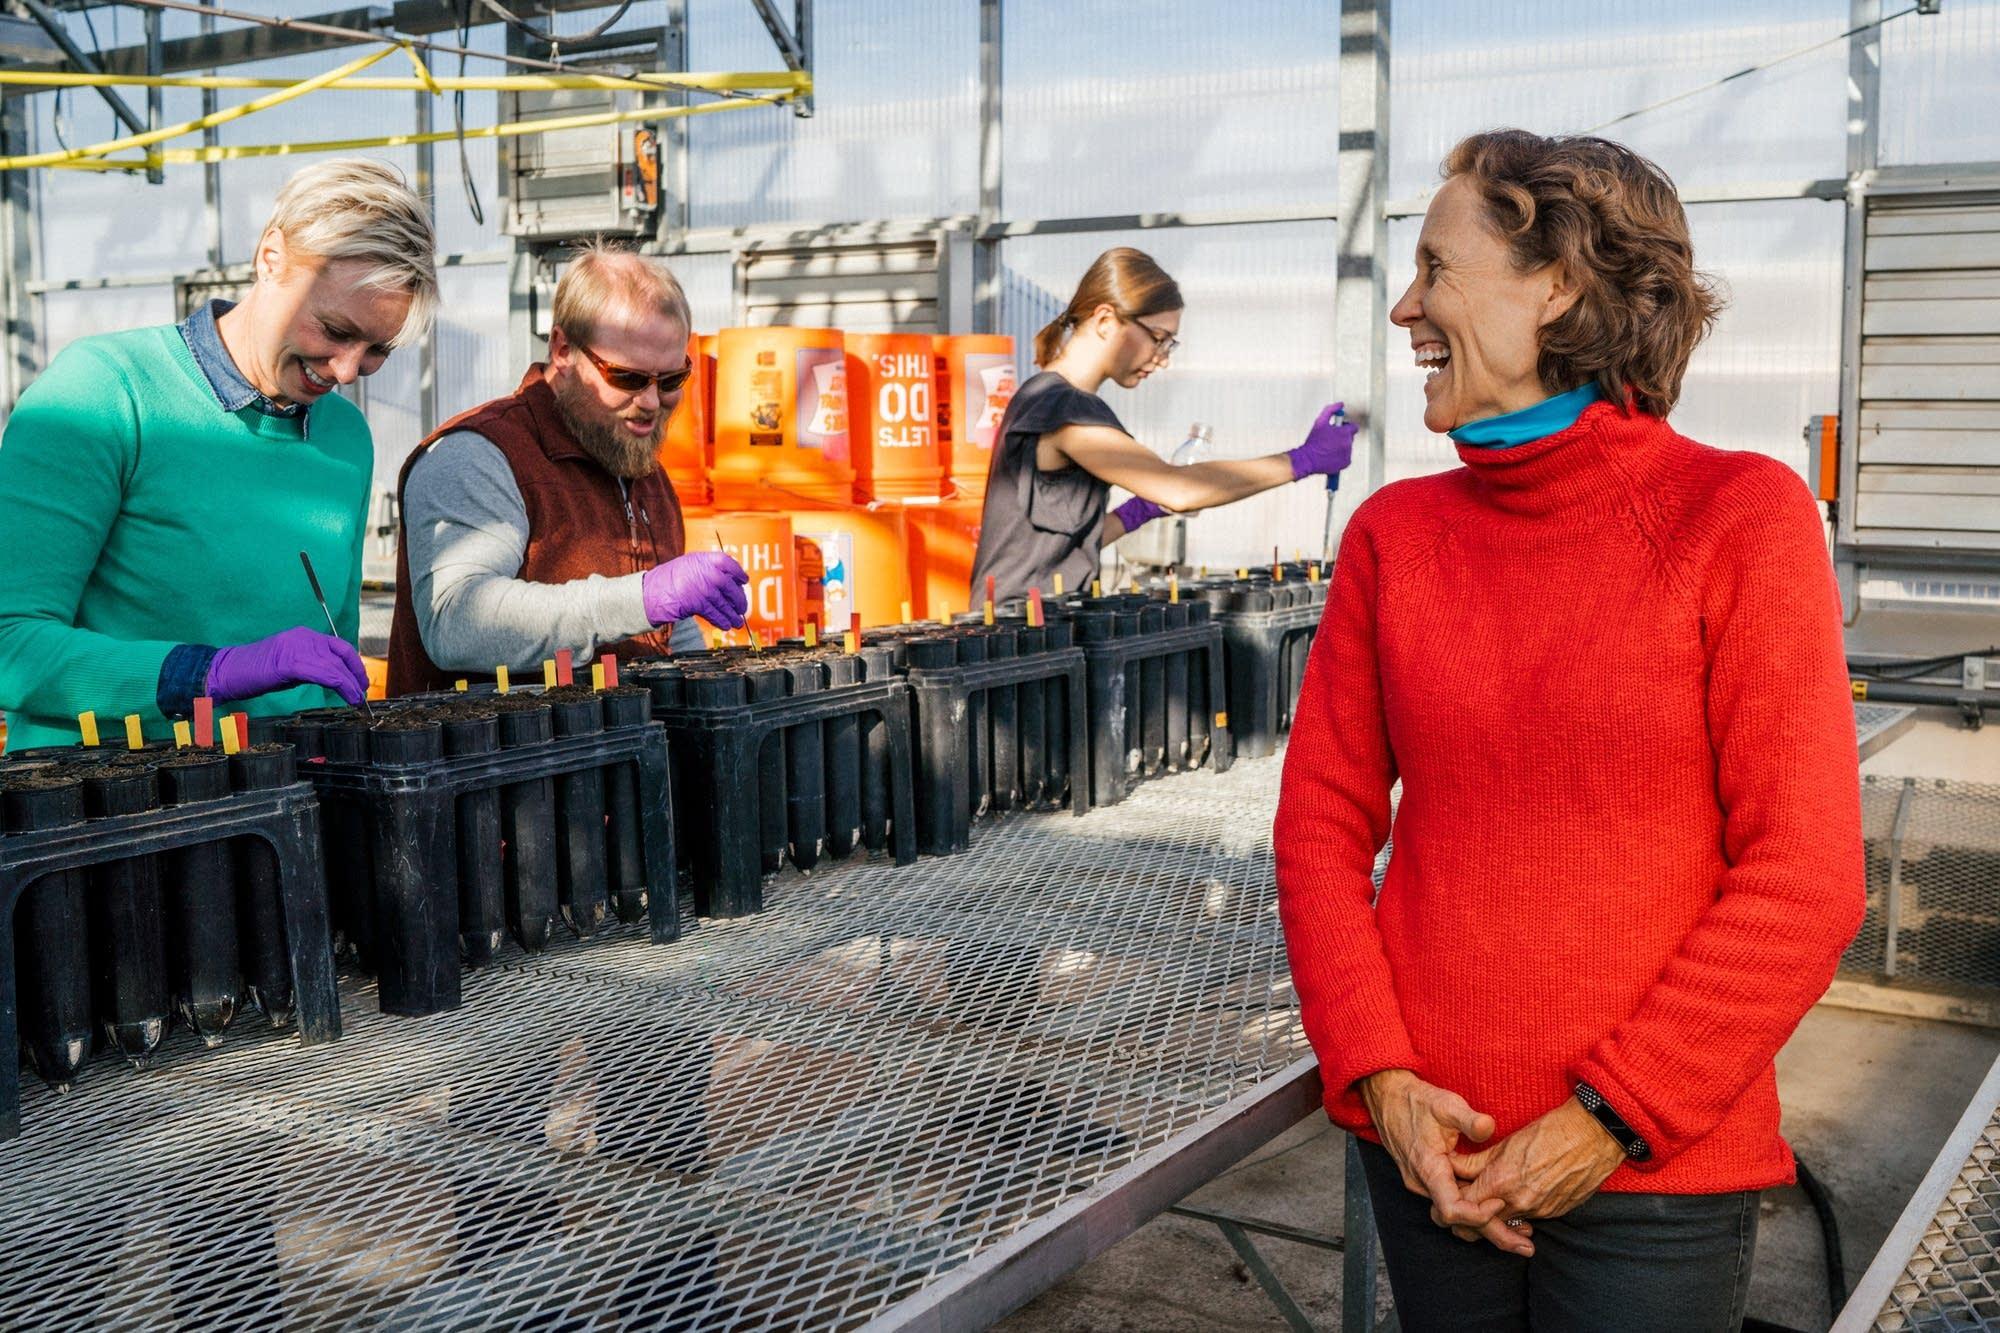 Professor Linda Kinkel Ph.D. watches her researchers prepare an experiment.